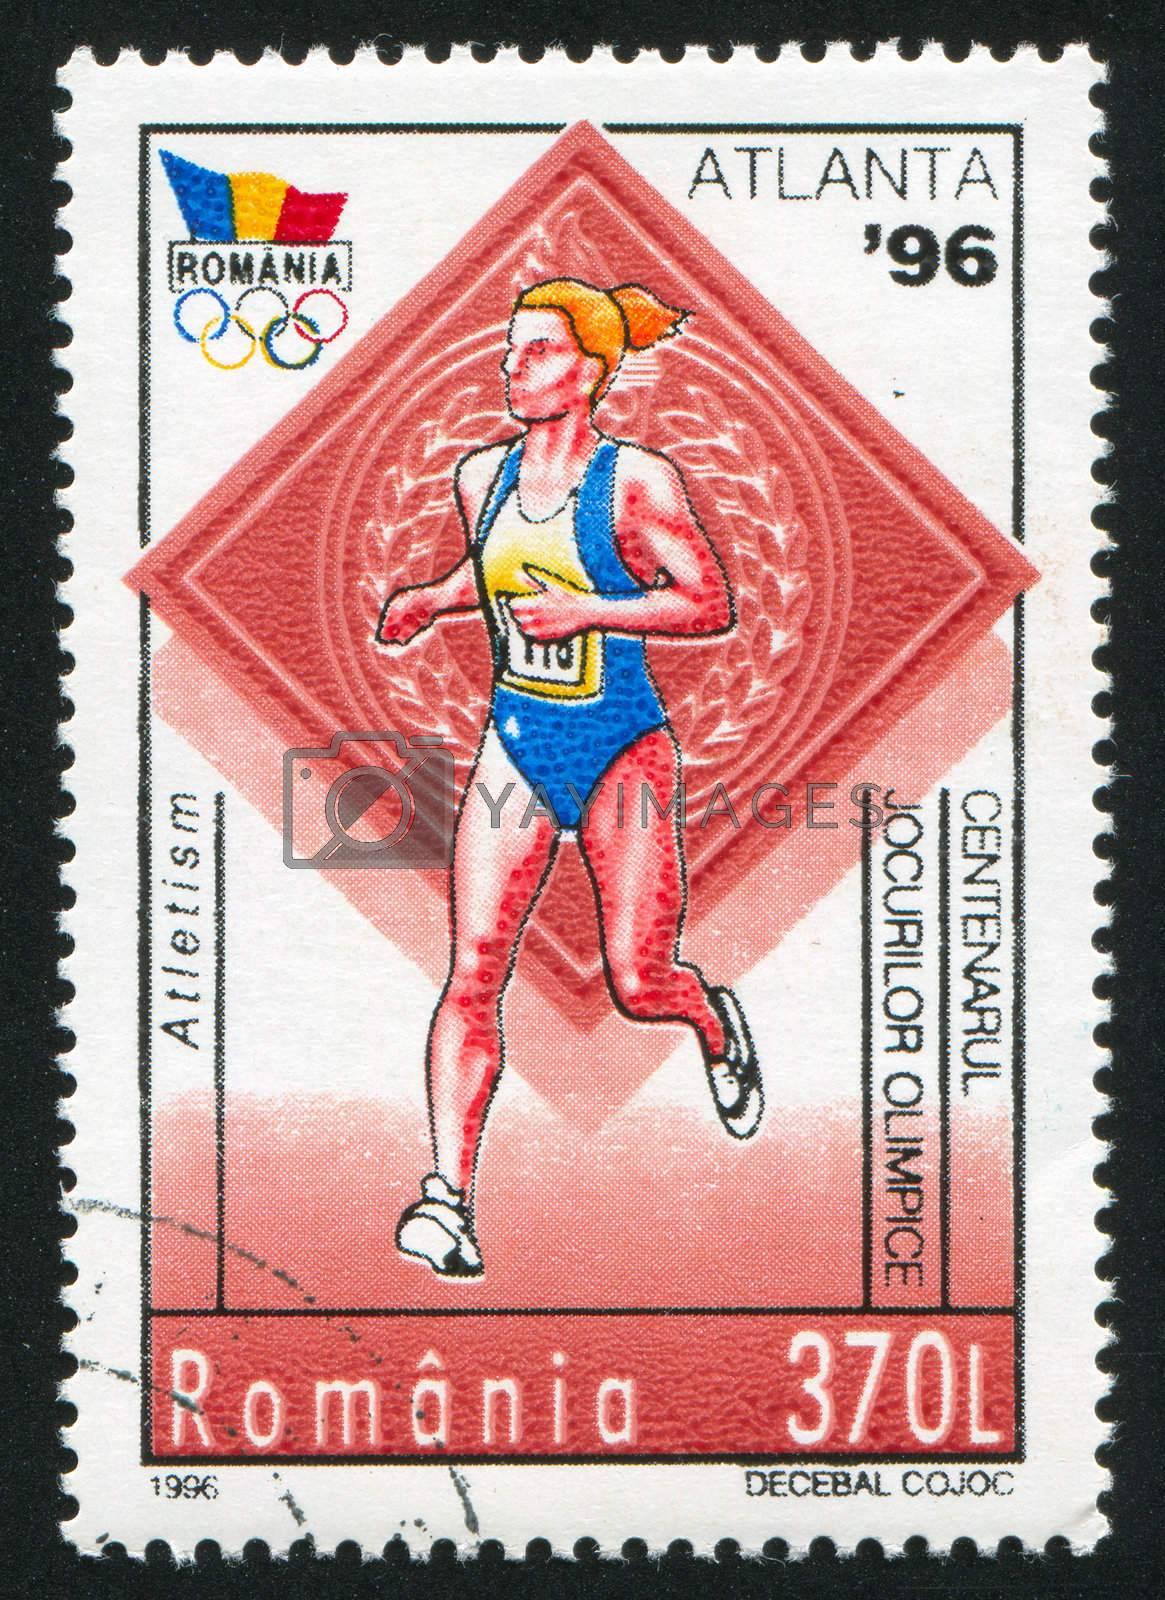 ROMANIA - CIRCA 1996: stamp printed by Romania, show runner, circa 1996.